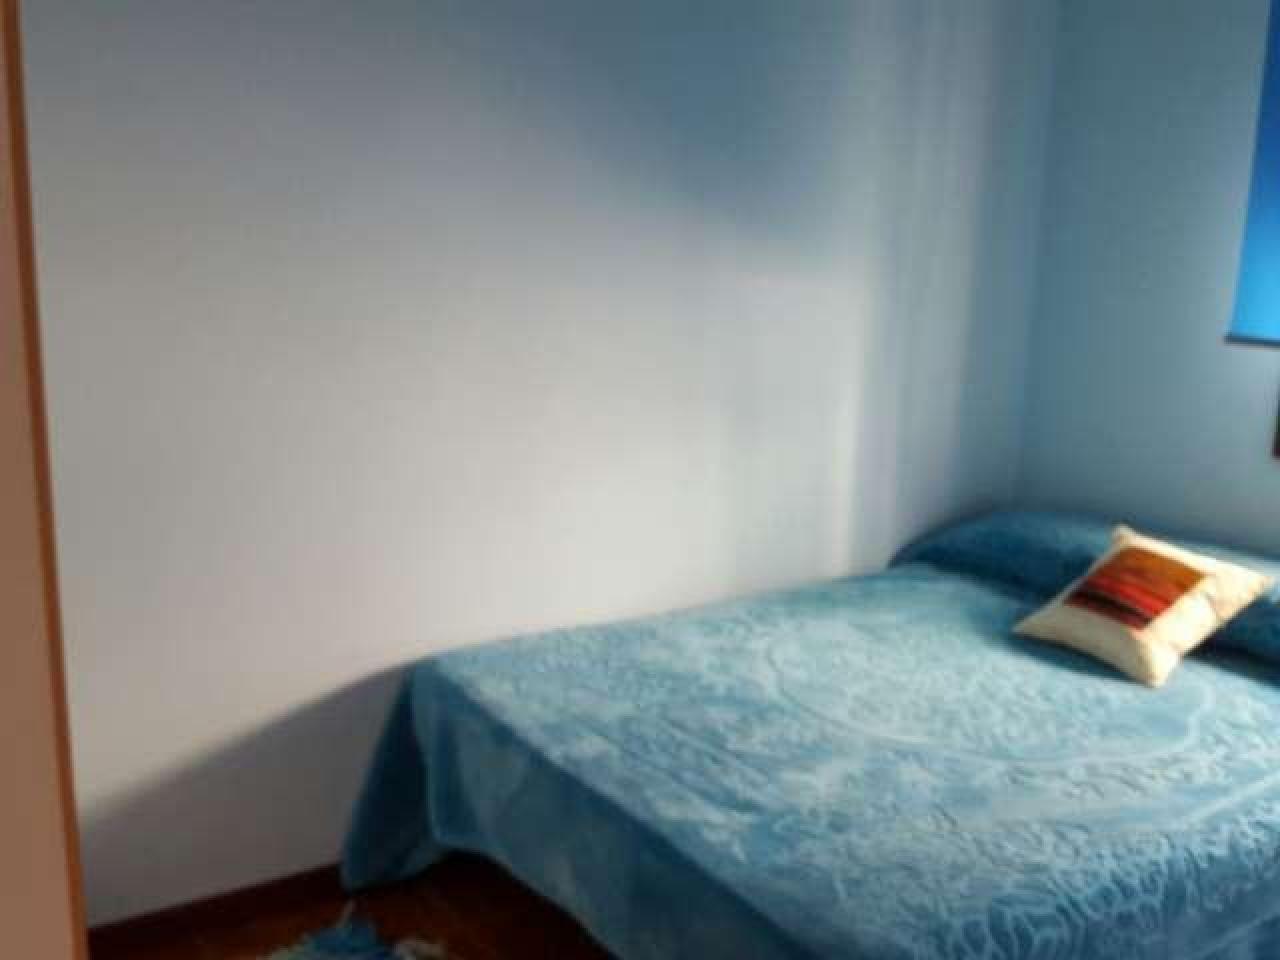 Apartamento vacacional Tuy, Pontevedra